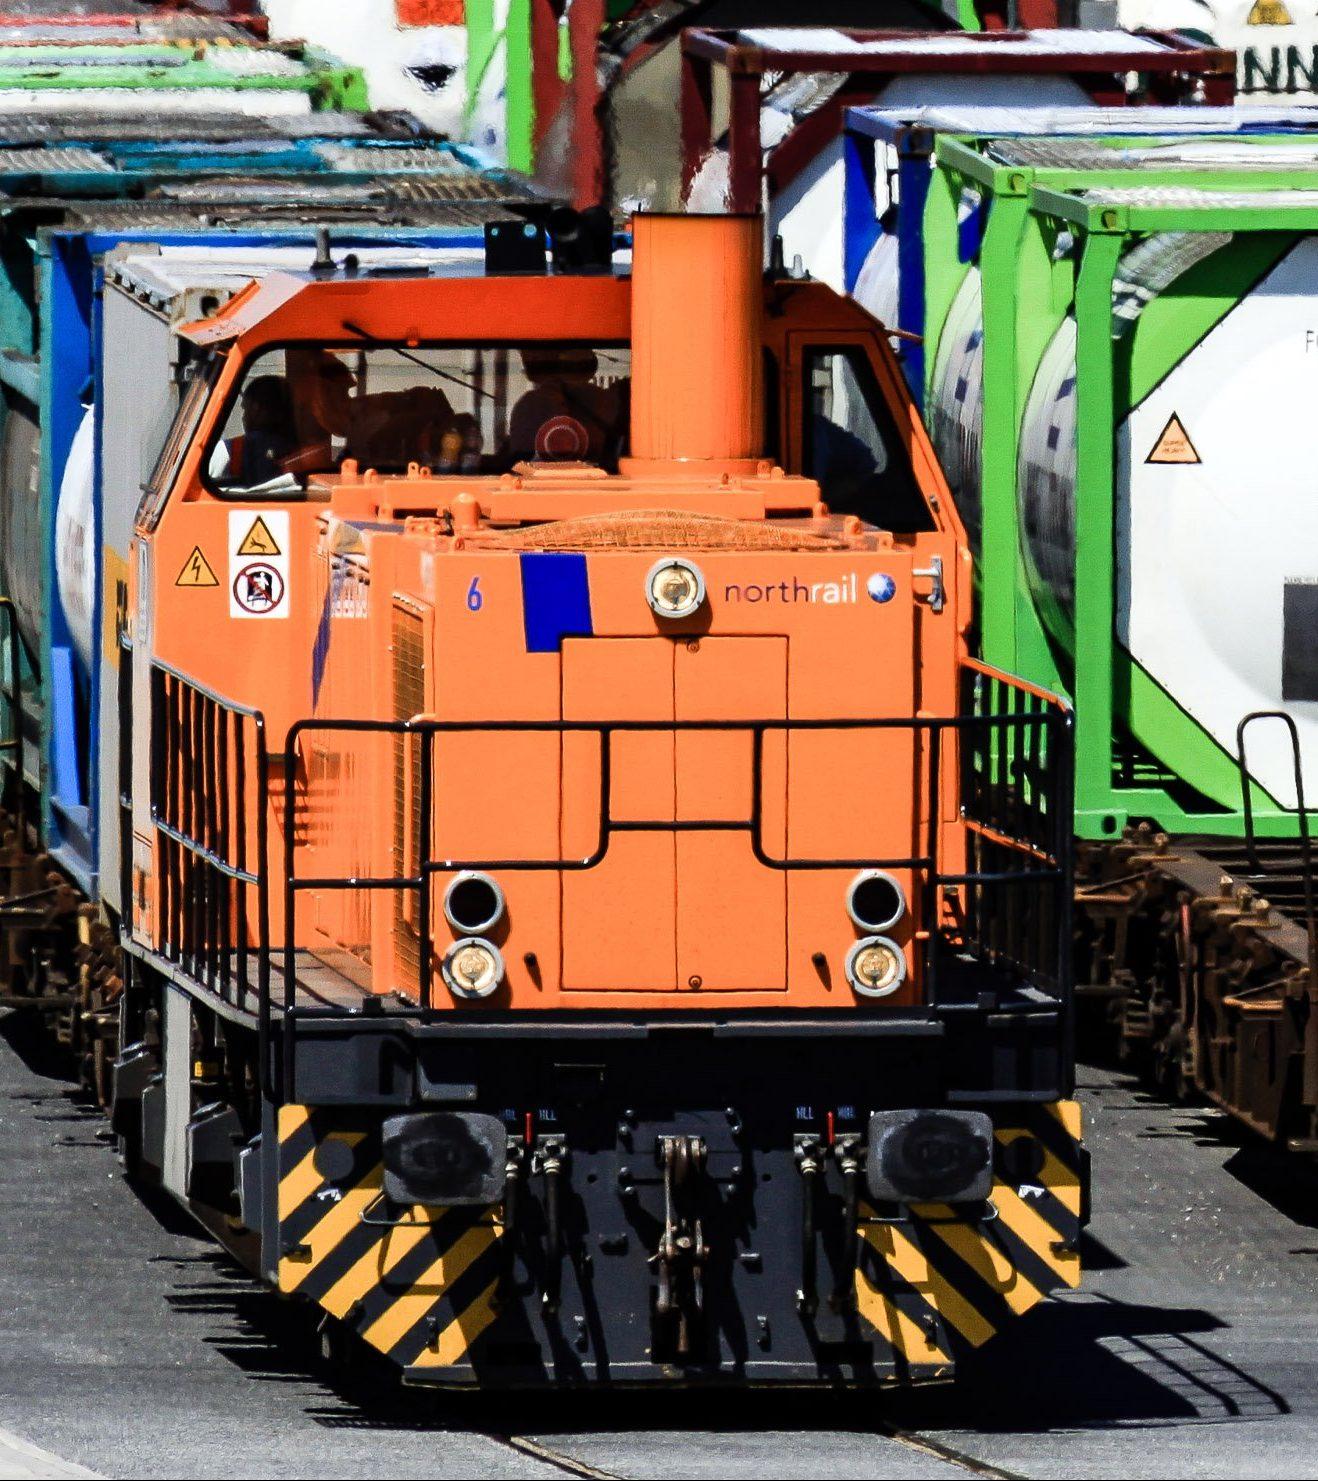 Paribus Rail Portfolio I - northrail-Lokomotive mit Güterwaggons